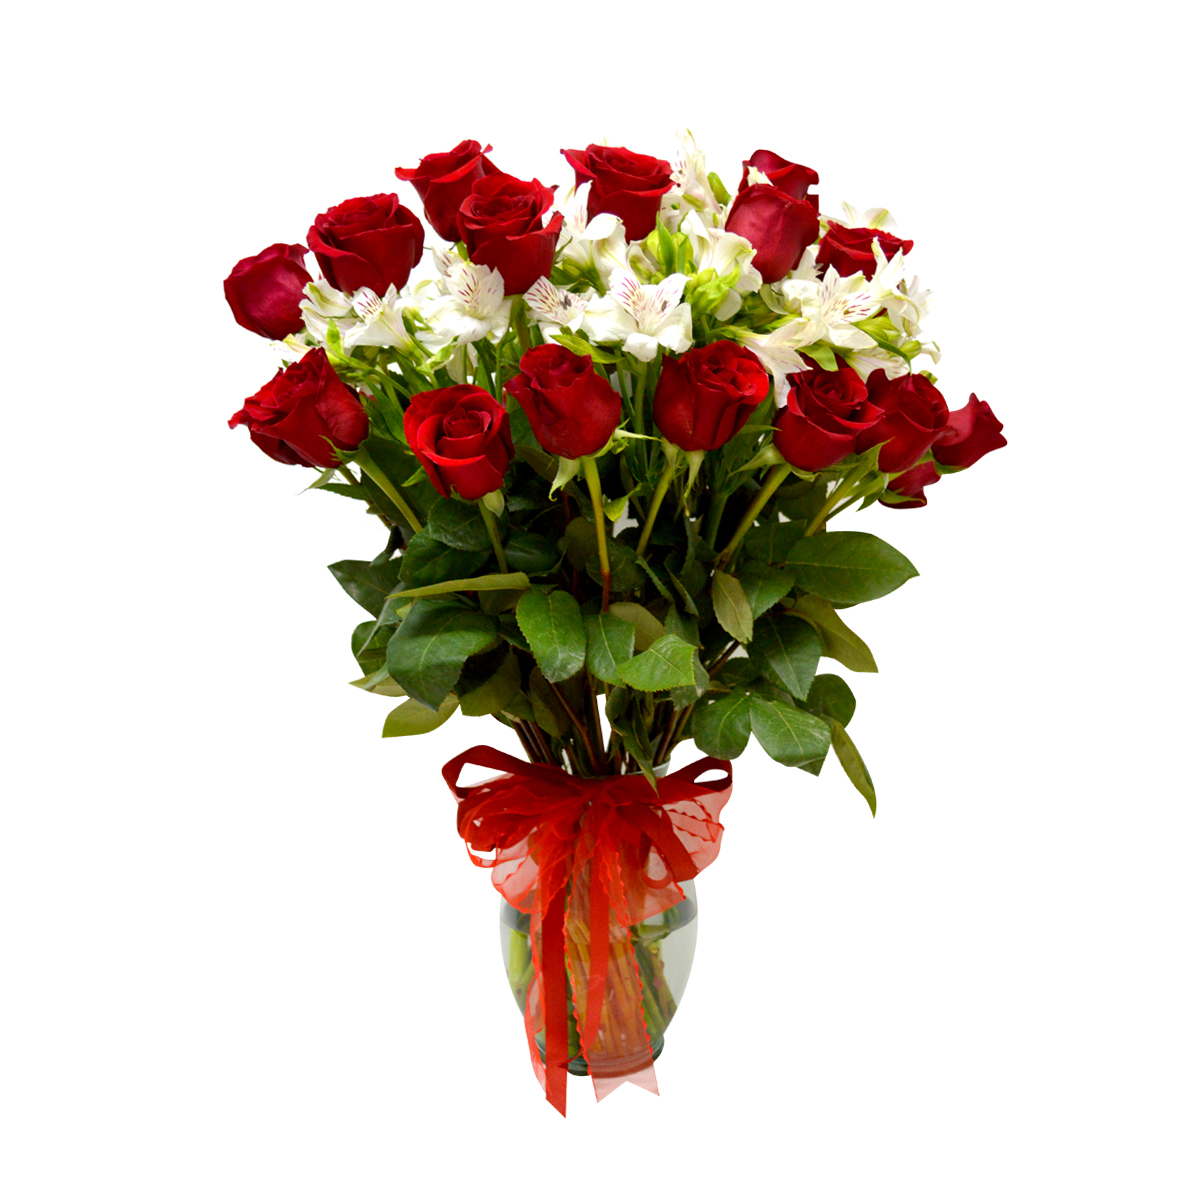 Florero con 24 Rosas mas Alstroemeria